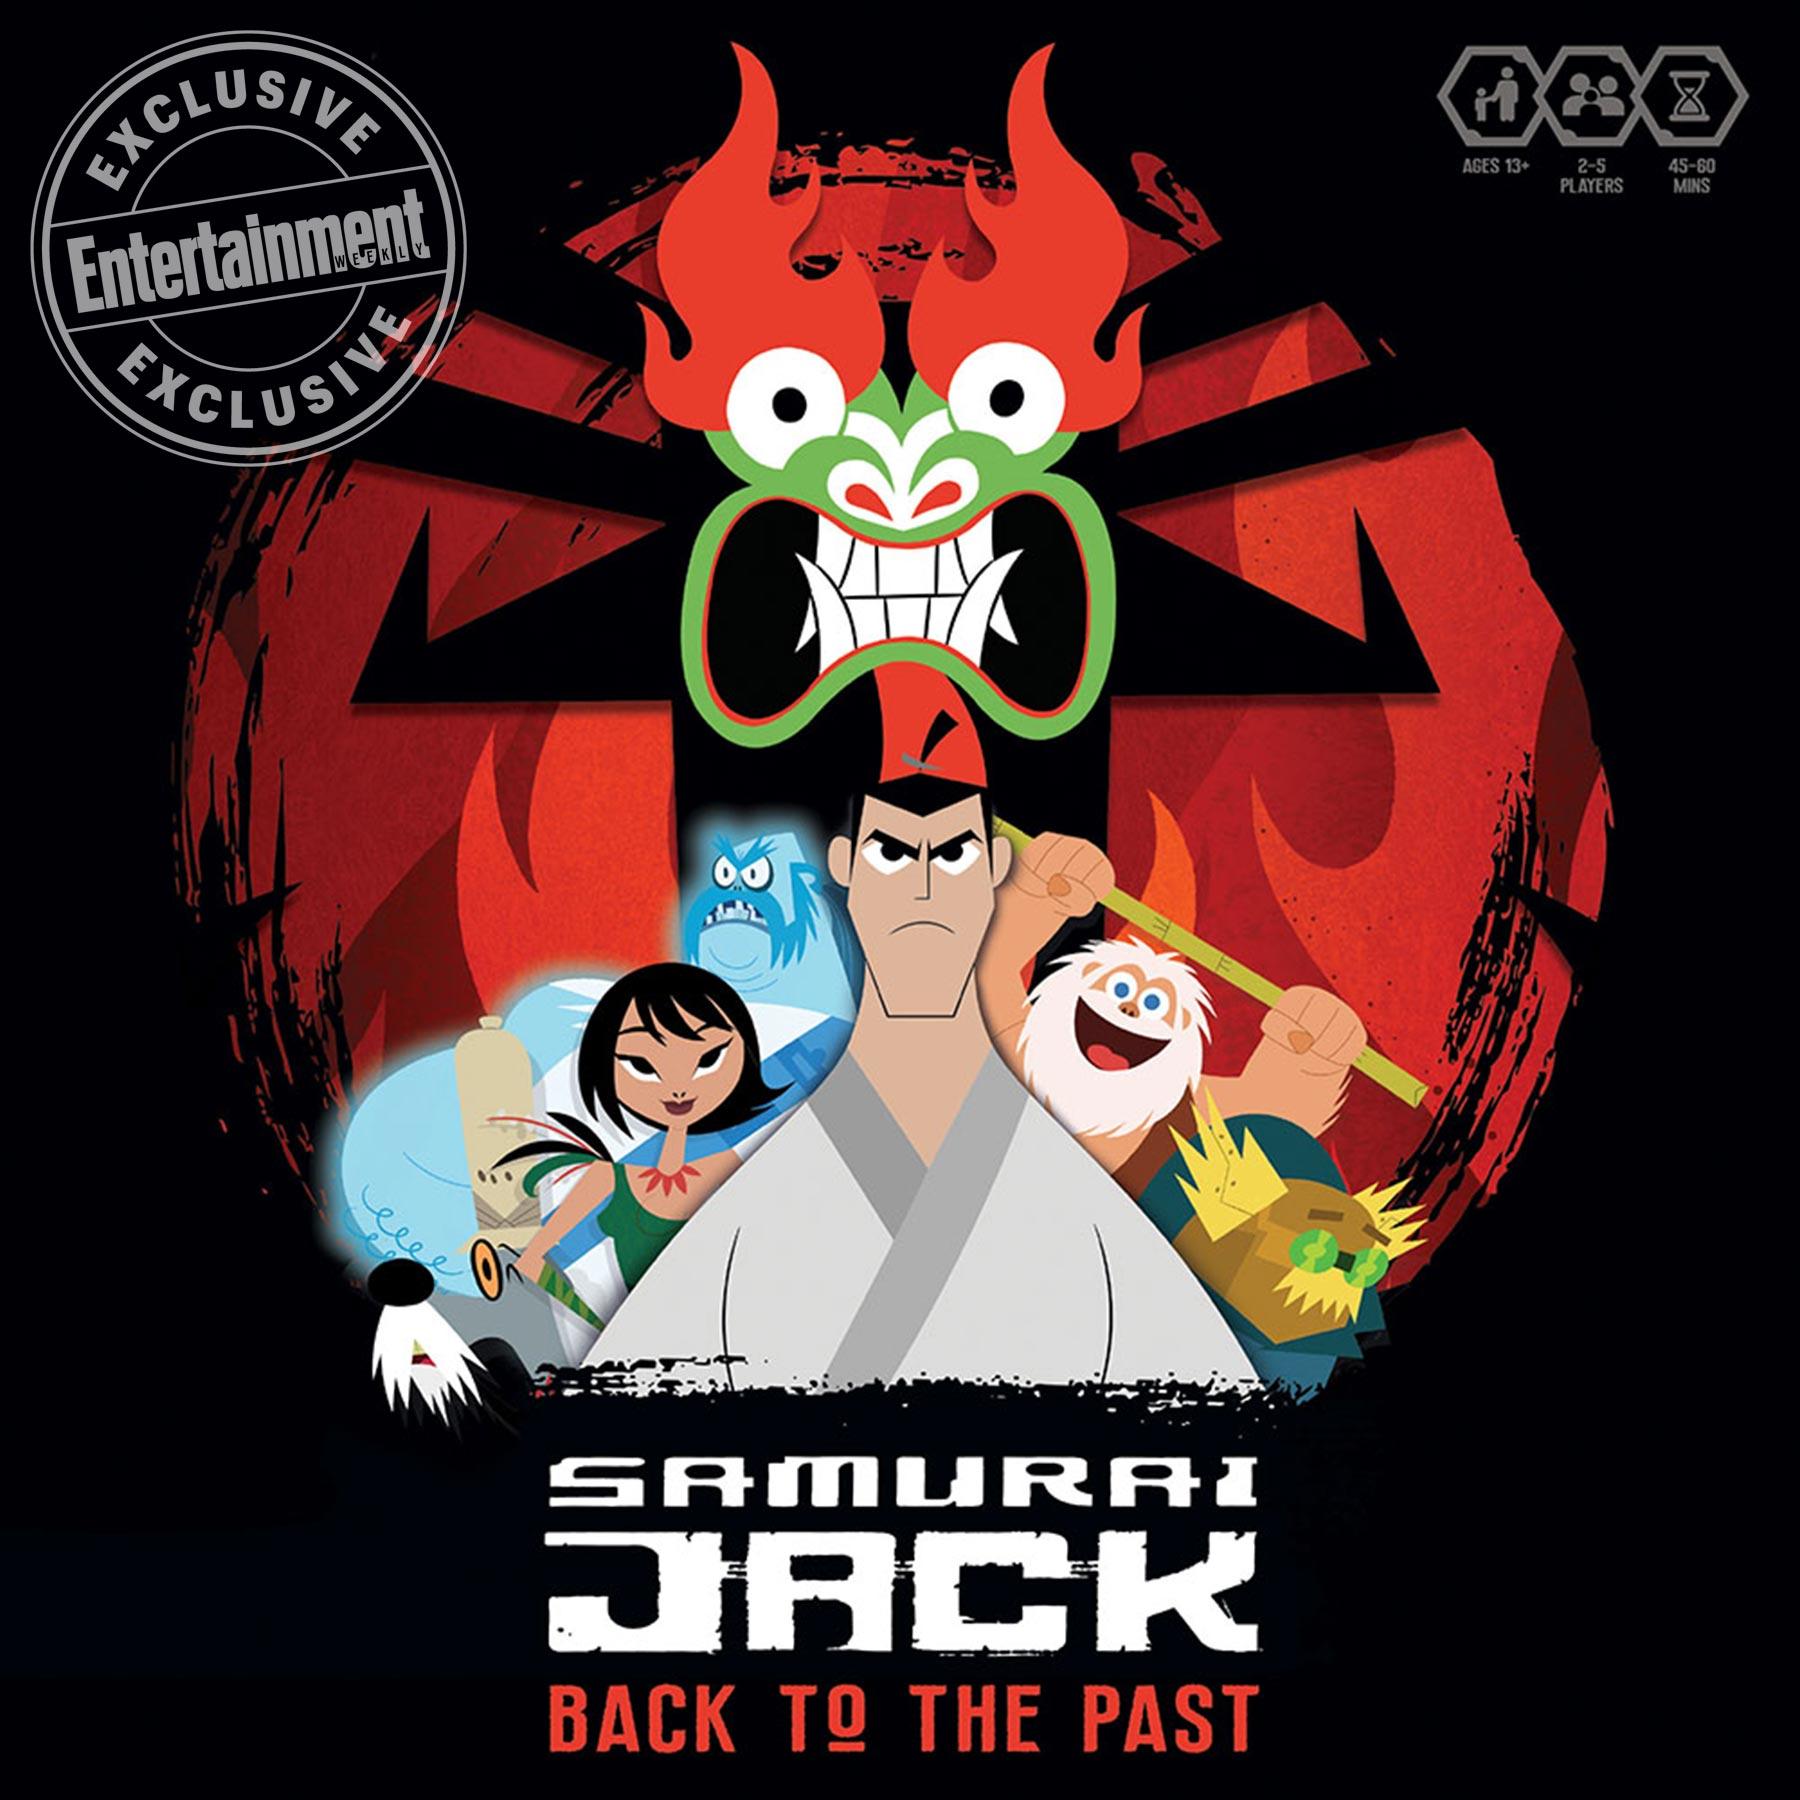 Samurai Jack board game CR: USAopoly, Inc.